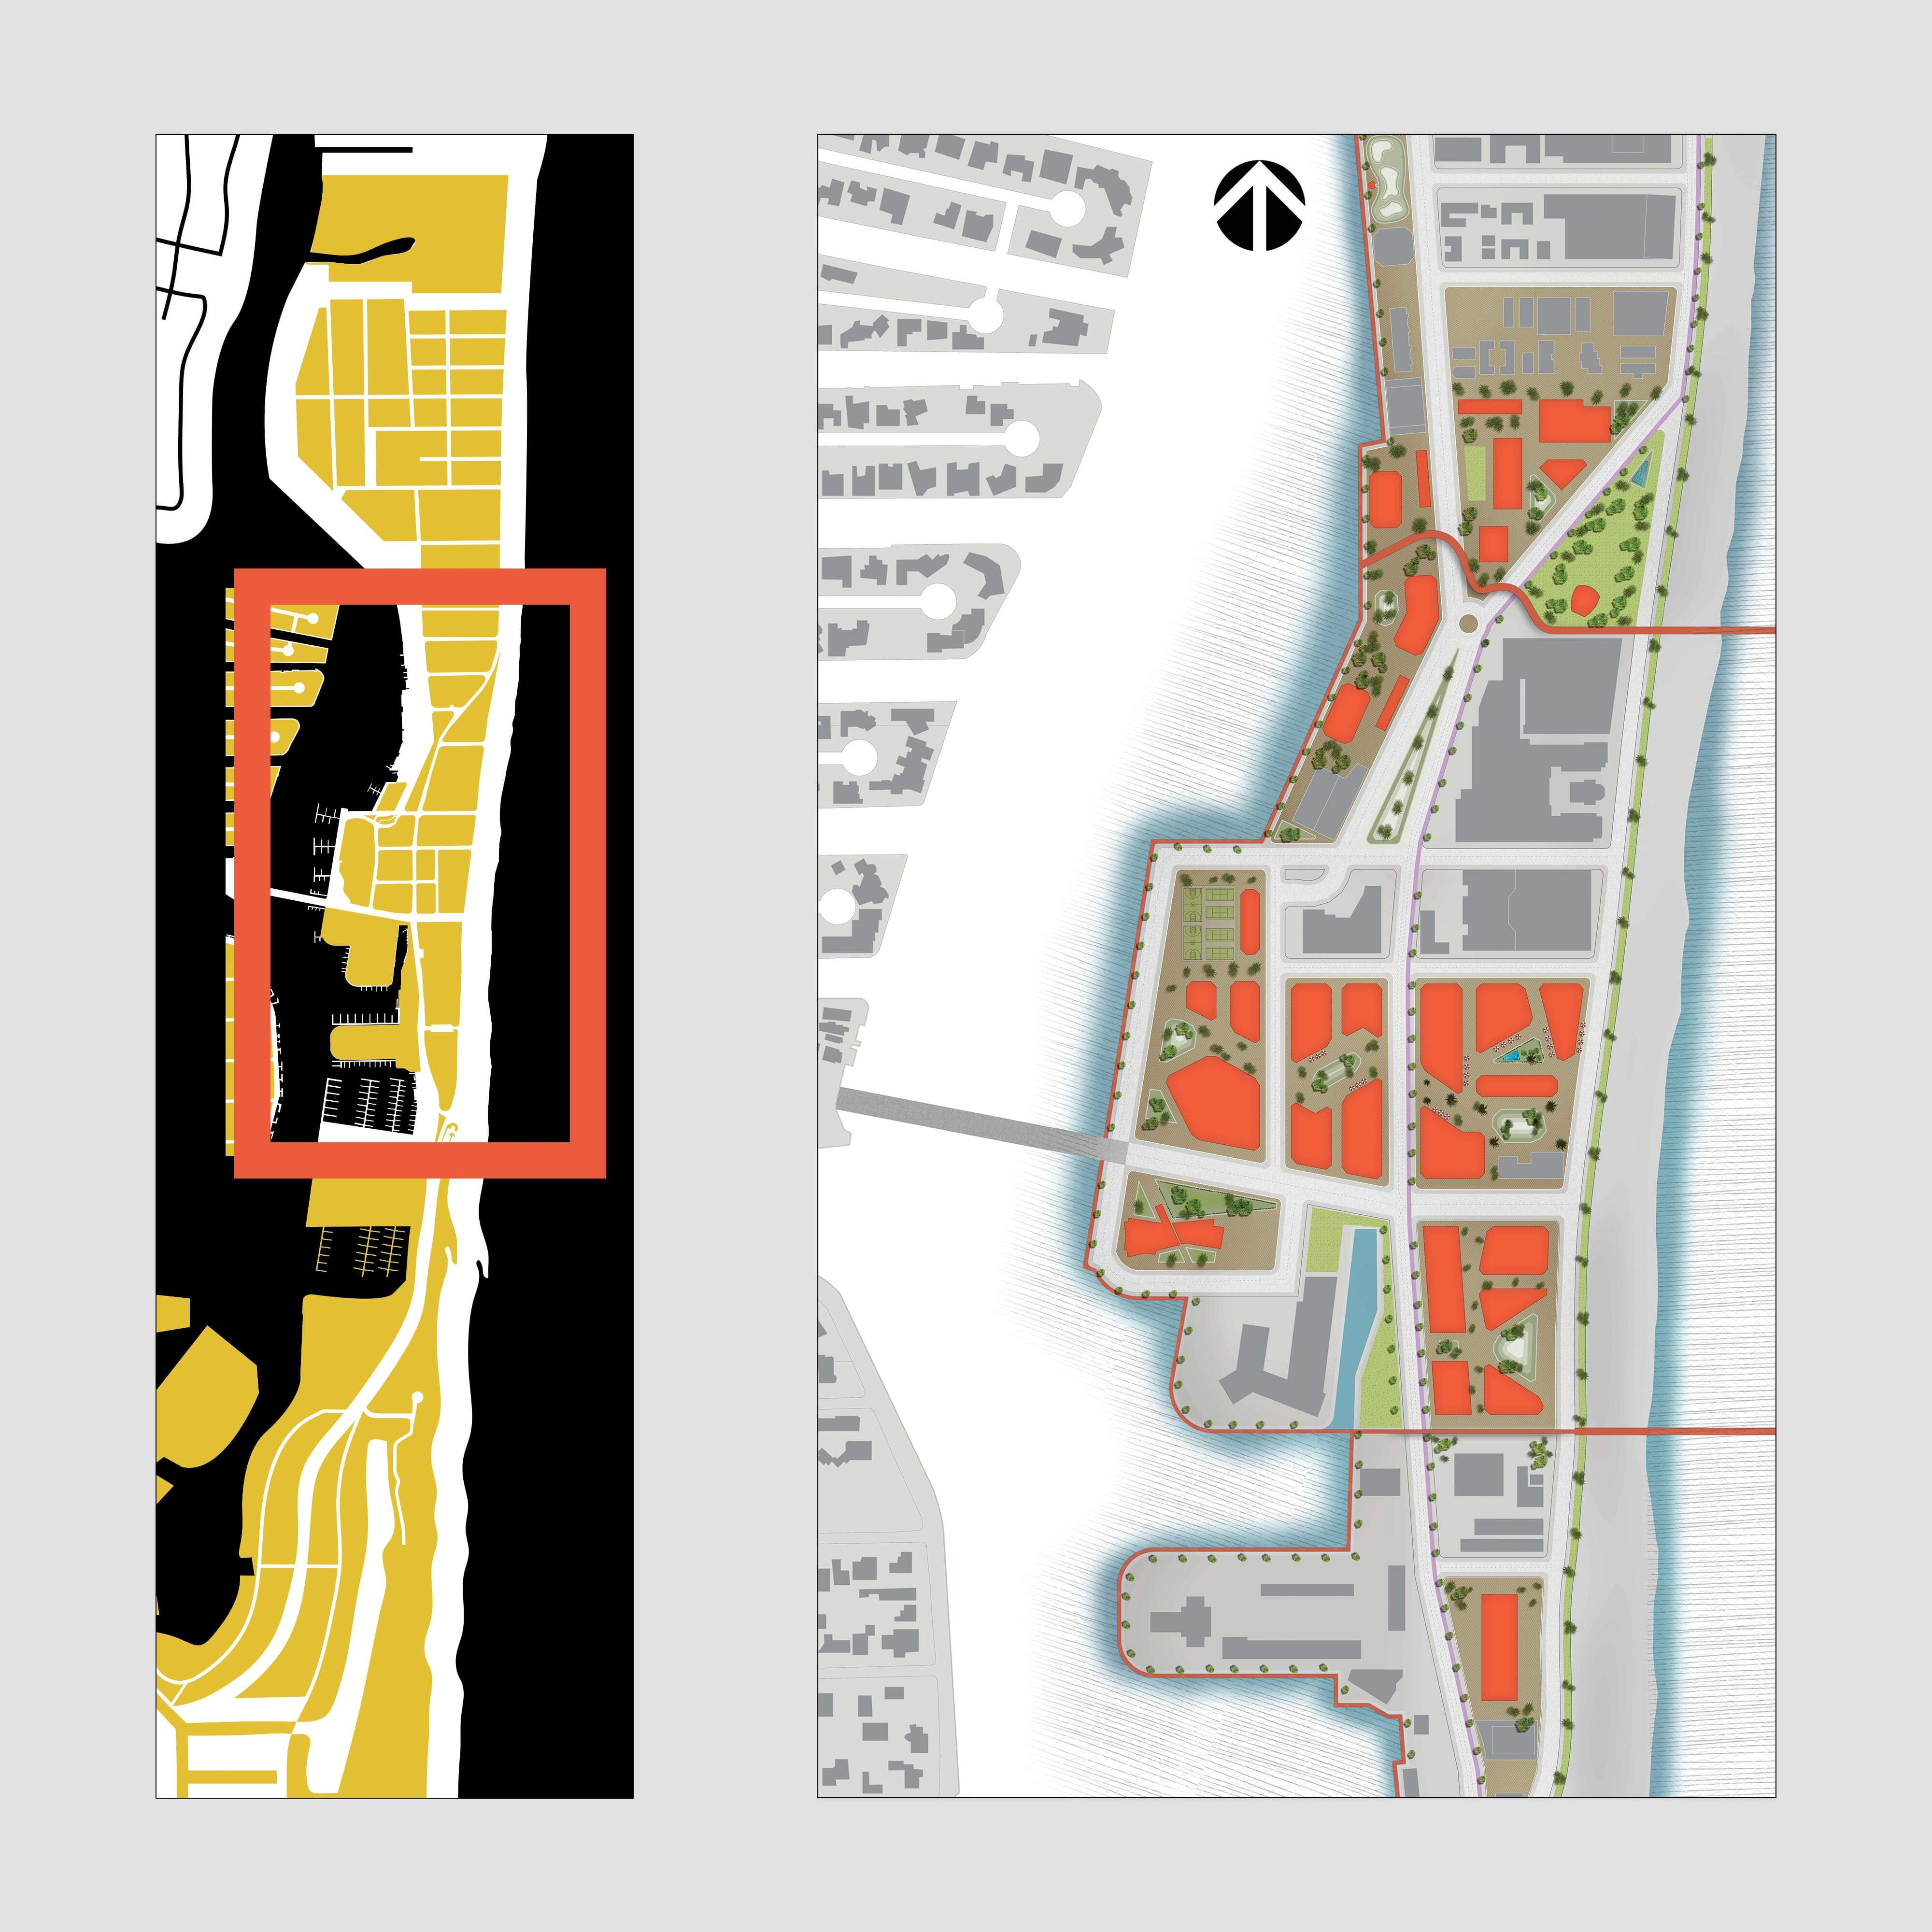 Site Plan Study